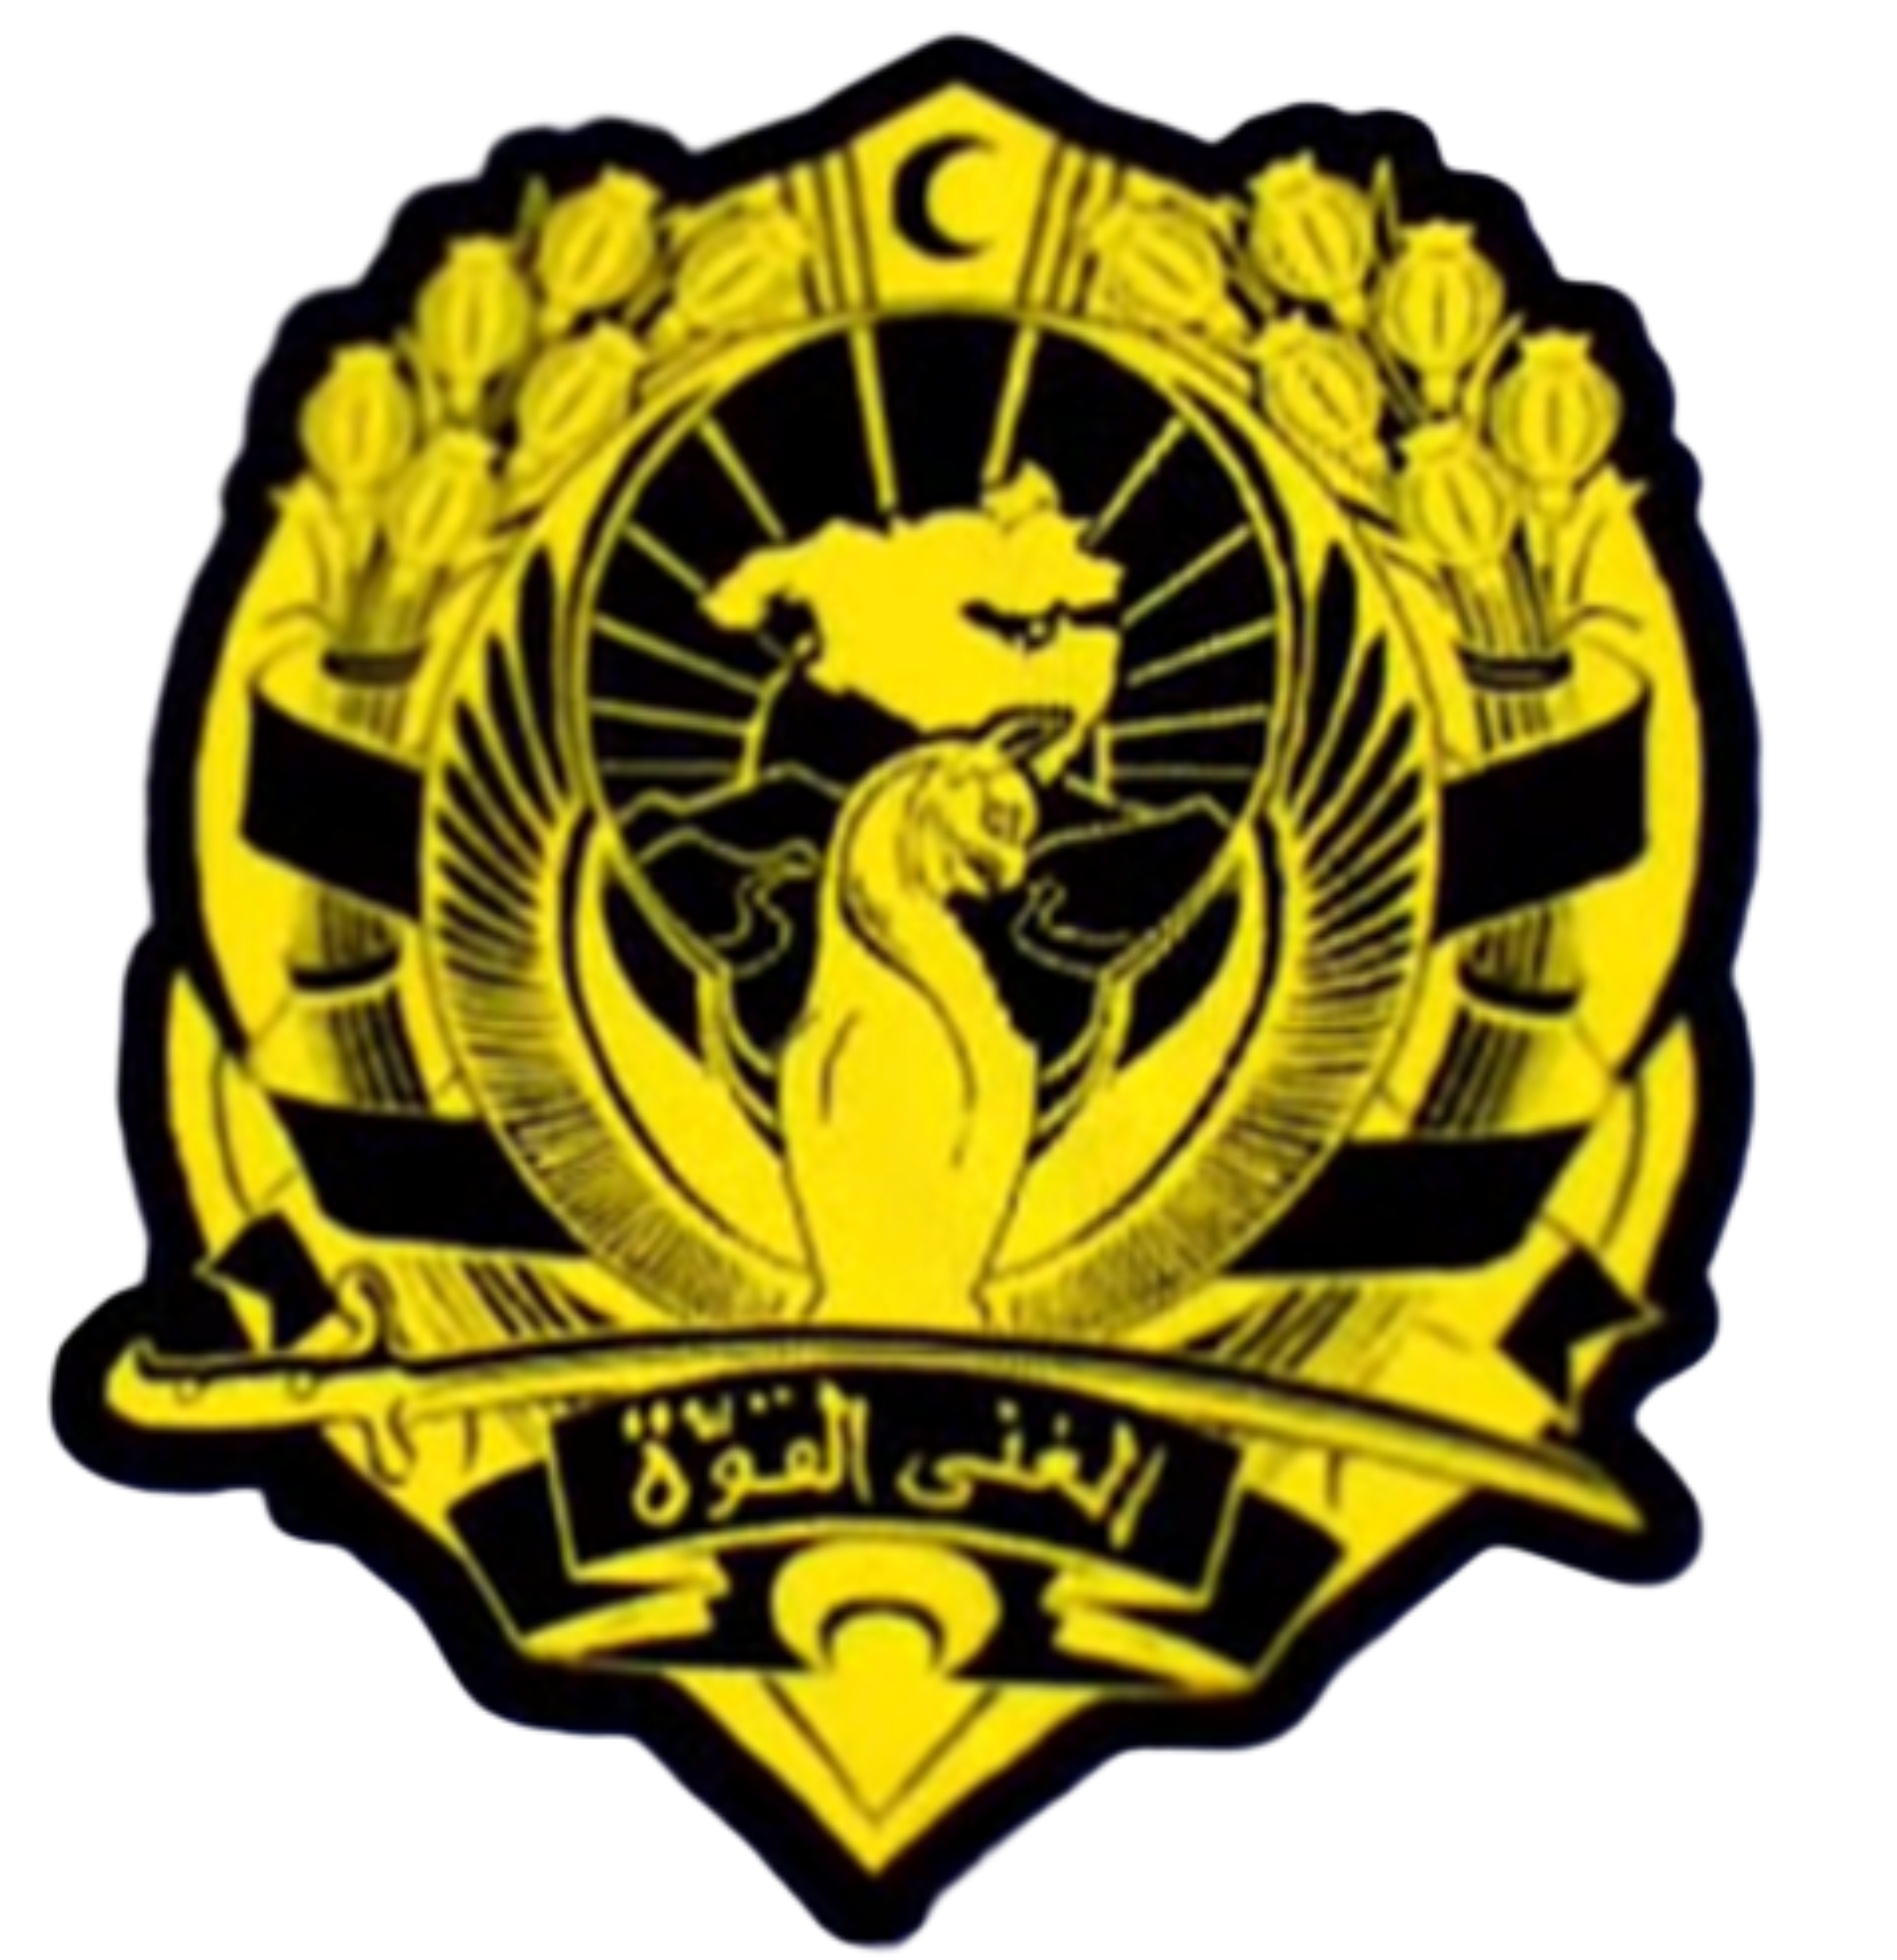 Al-Qatala